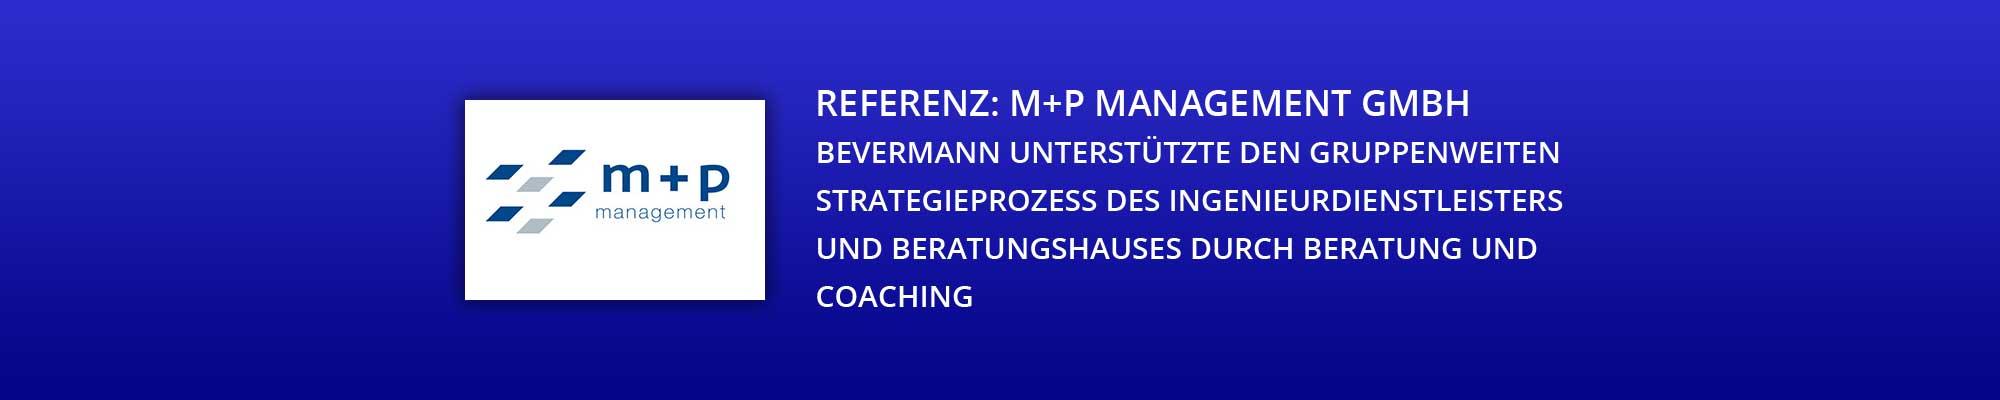 m+p-management-GmbH